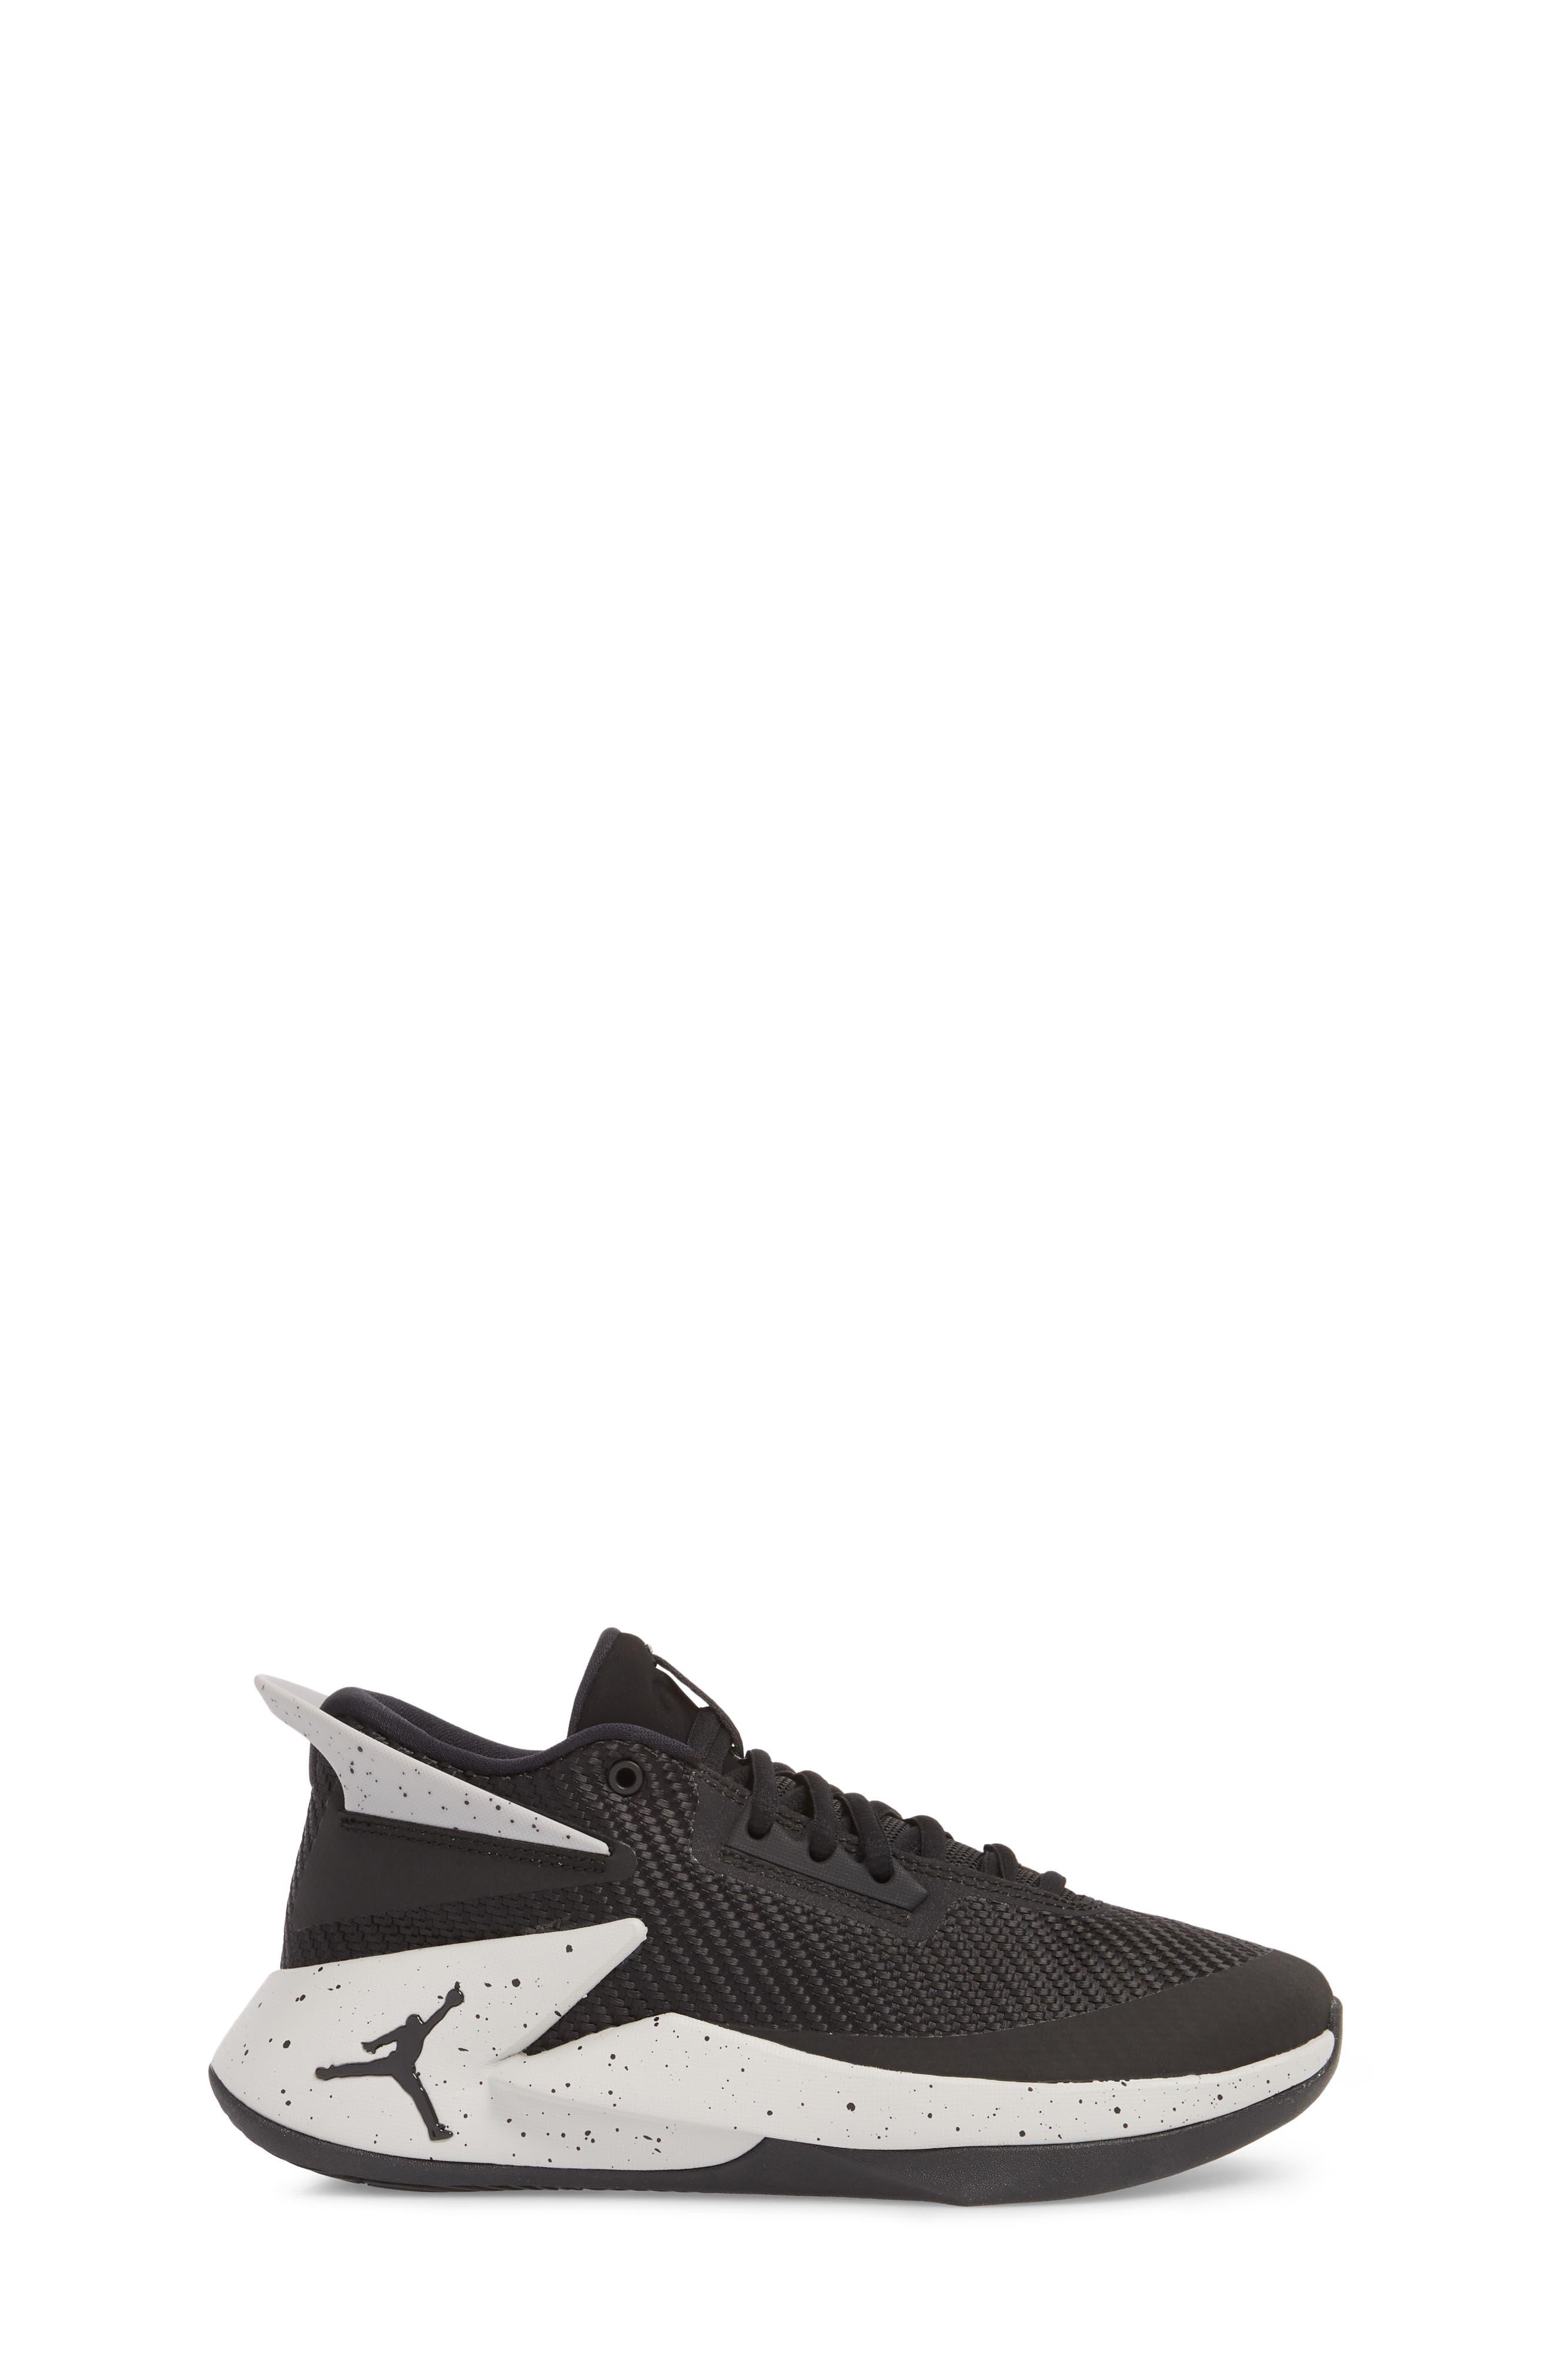 JORDAN,                             Nike Jordan Fly Lockdown Sneaker,                             Alternate thumbnail 3, color,                             010